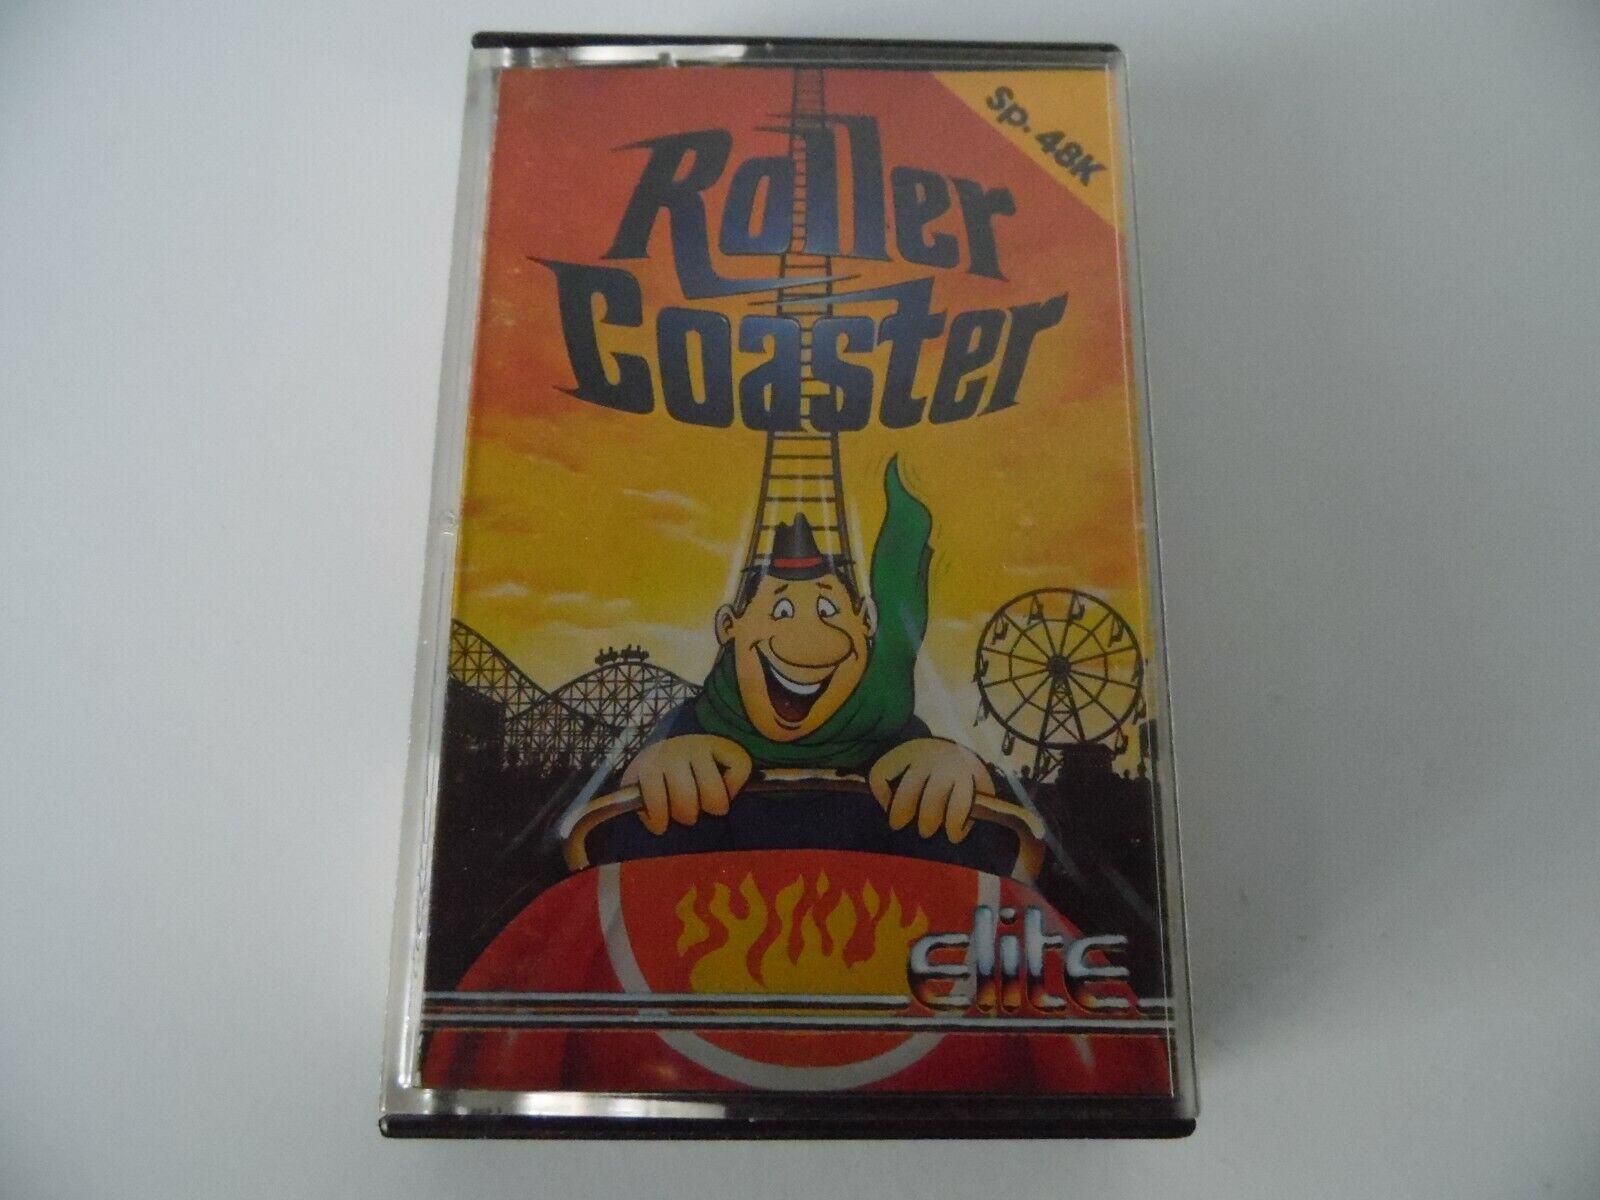 retro computer games - 1985 ELITE ROLLER COASTER VIDEO GAME CASSETTE SPECTRUM 48K COMPUTER RETRO ARCADE